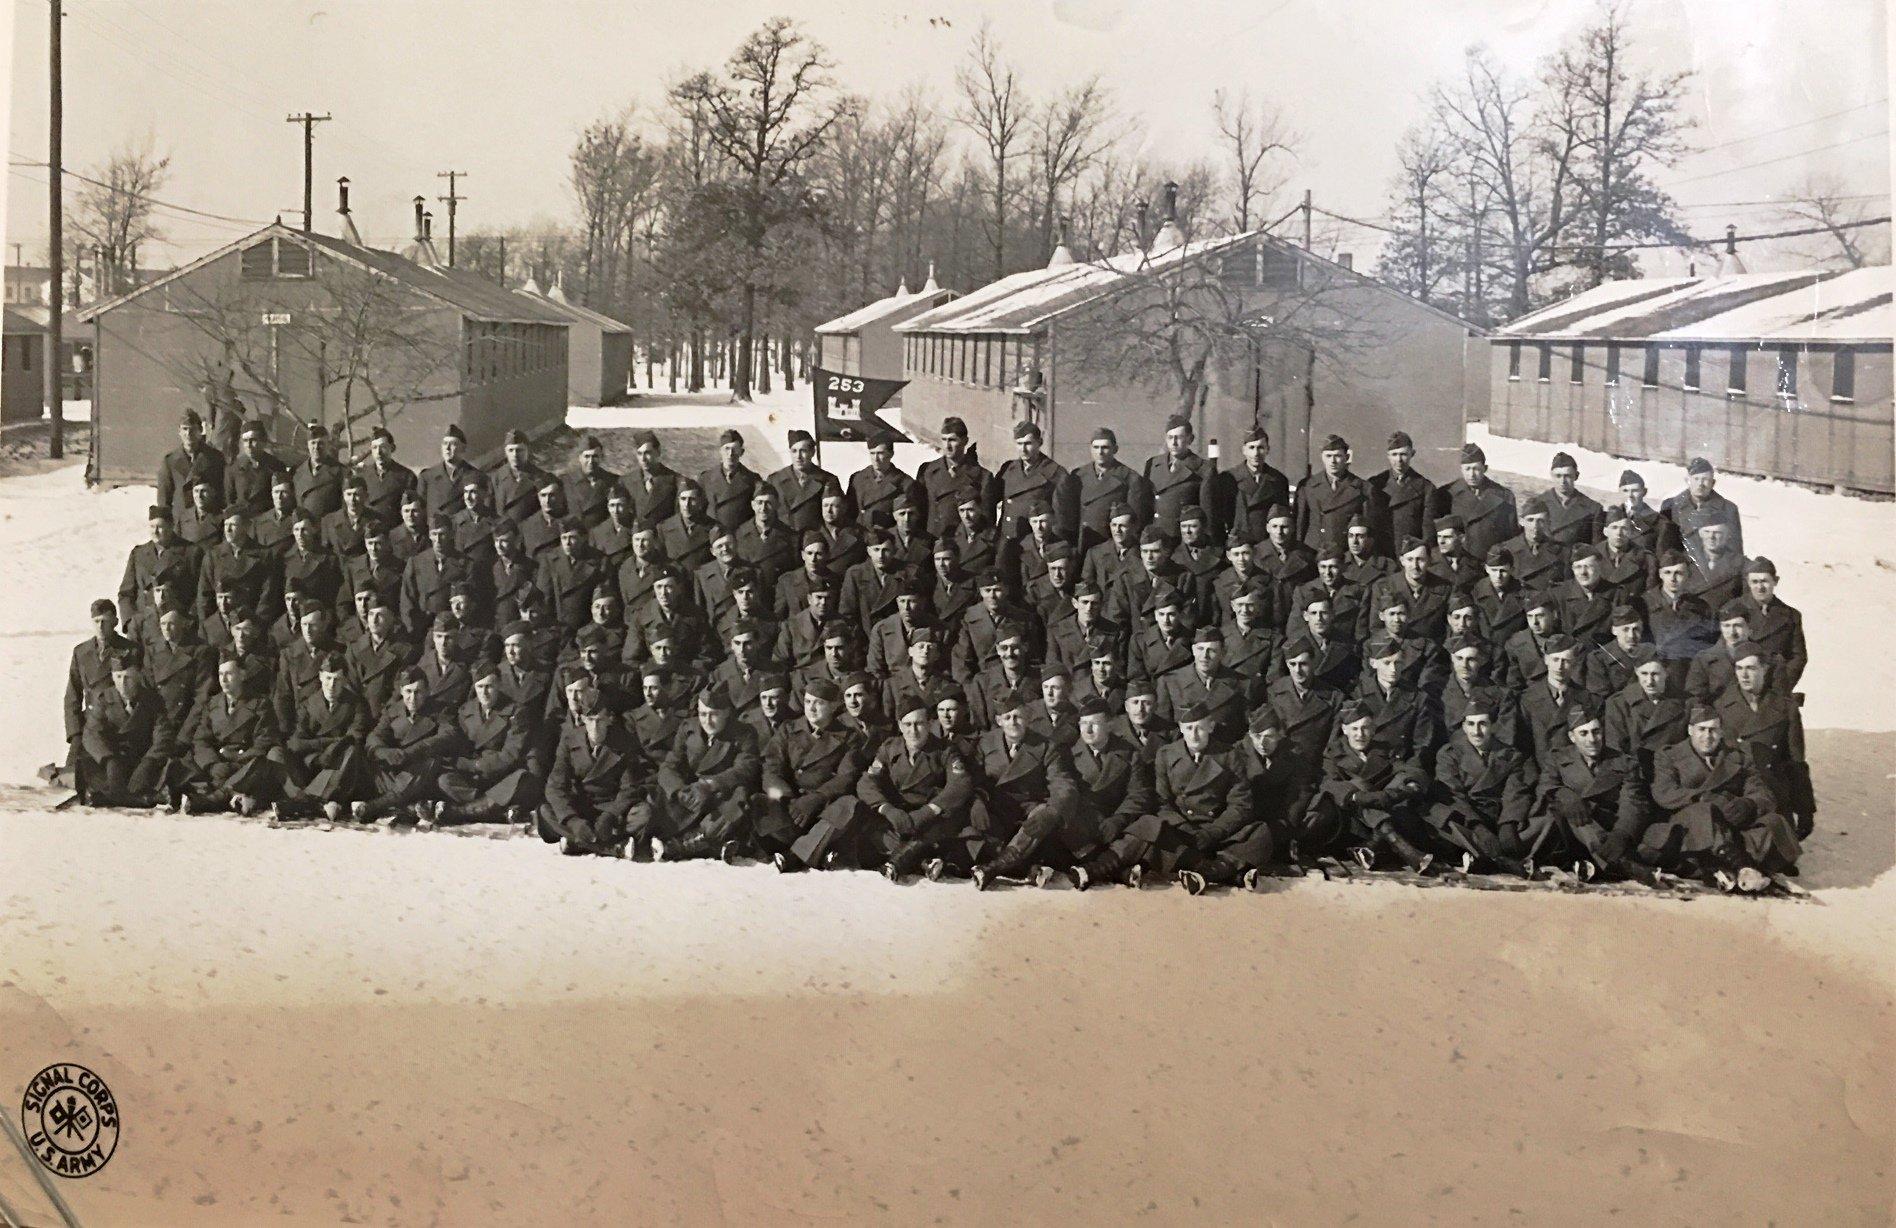 253rd Engr Combat BN.Camp Crowder 1944.JPG